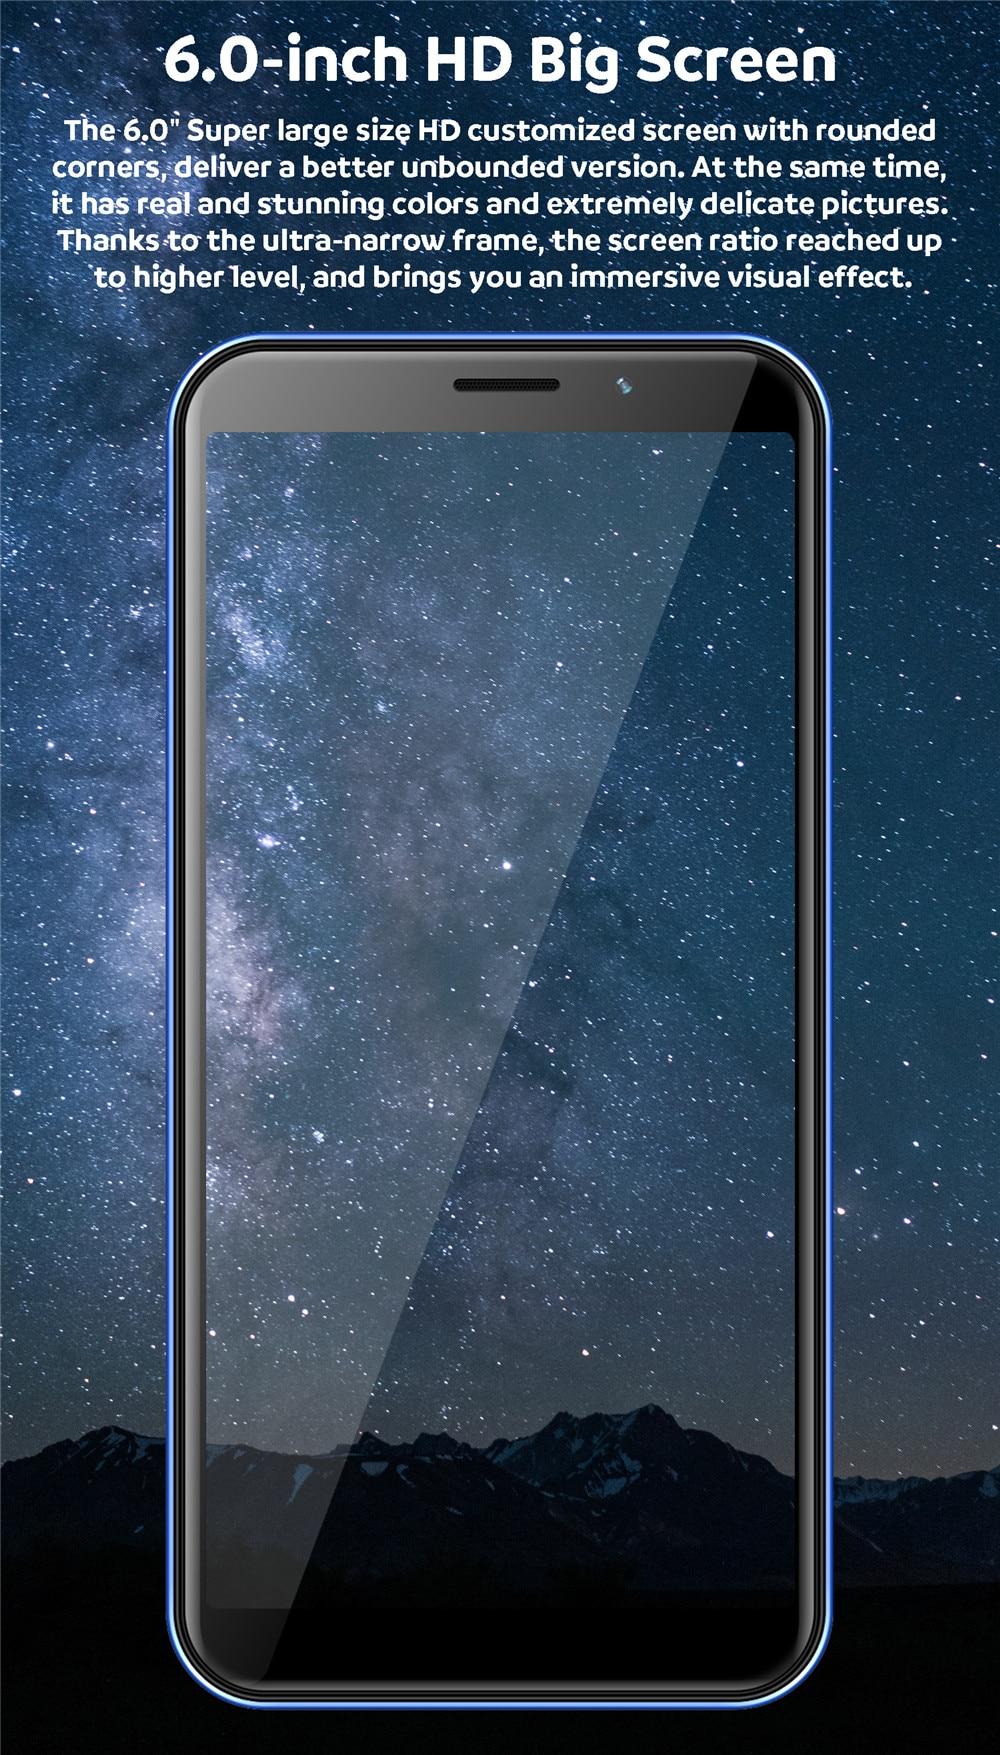 6.0-inch HD Big Screen